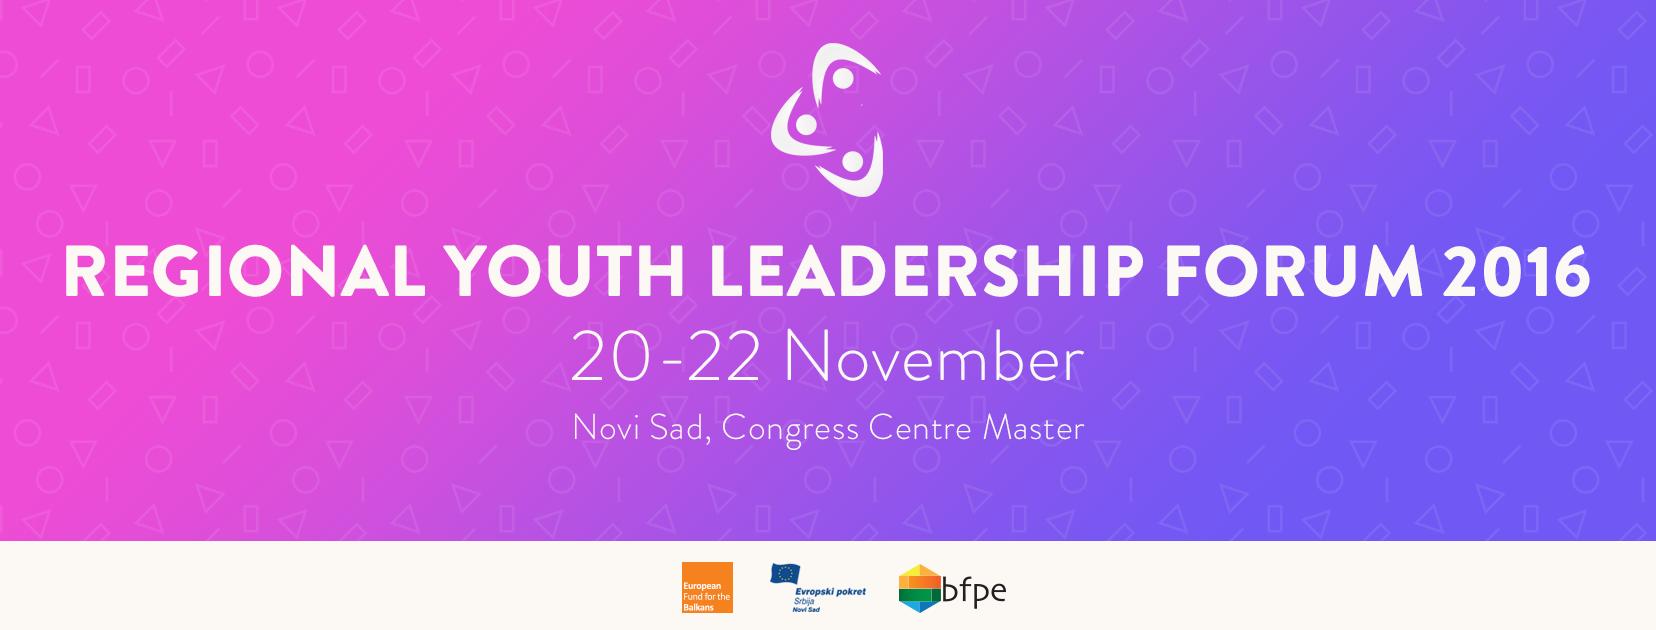 Regional Youth Leadership Forum 2016